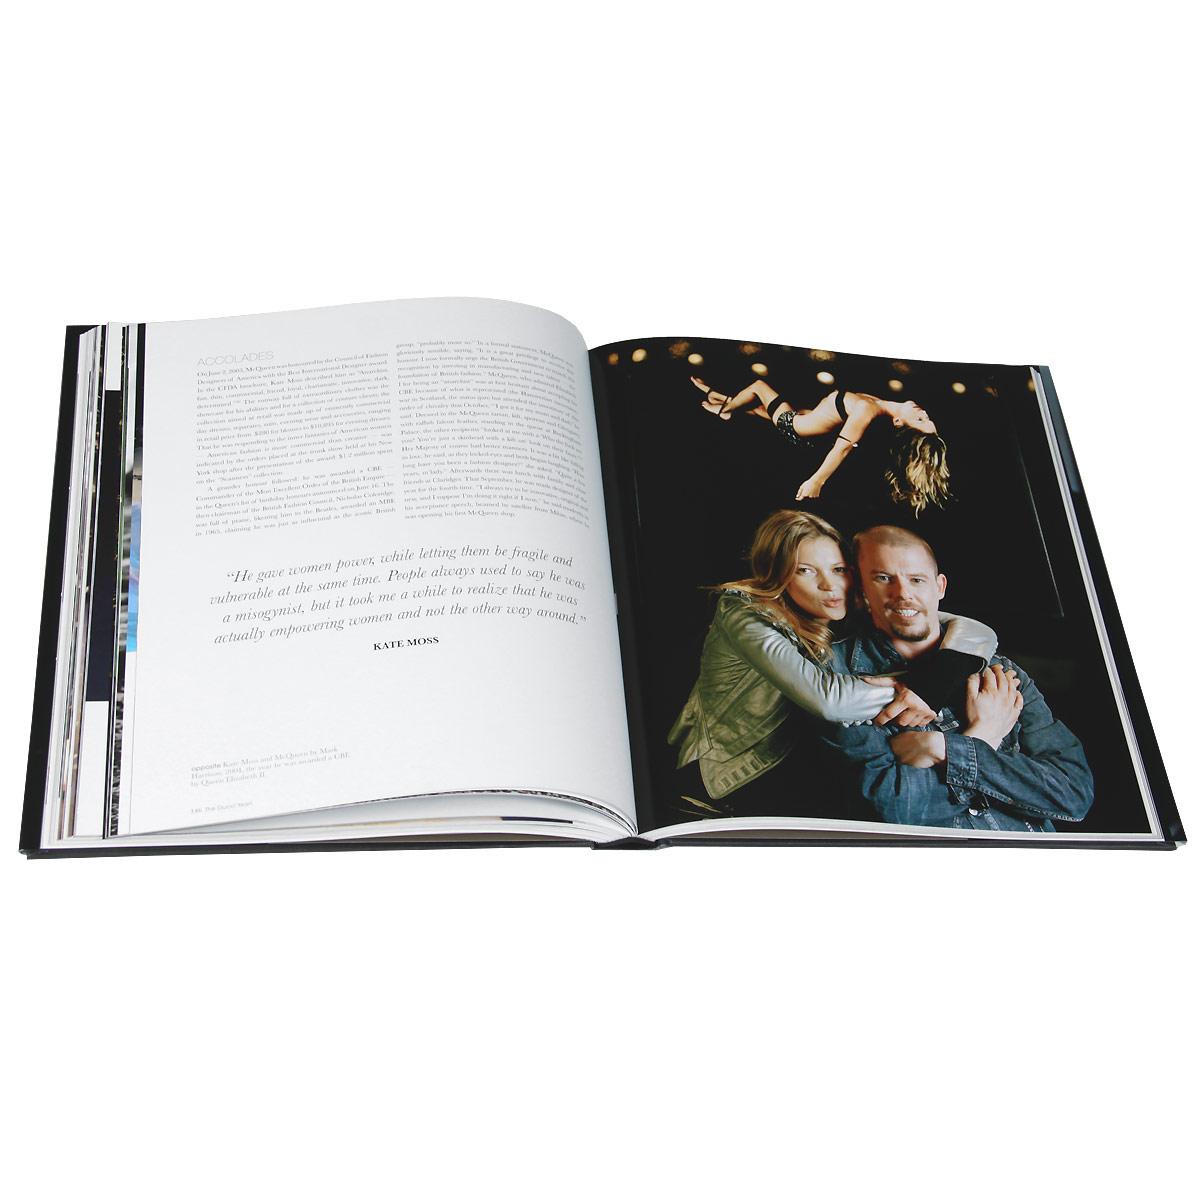 Alexander mcqueen fashion visionary book